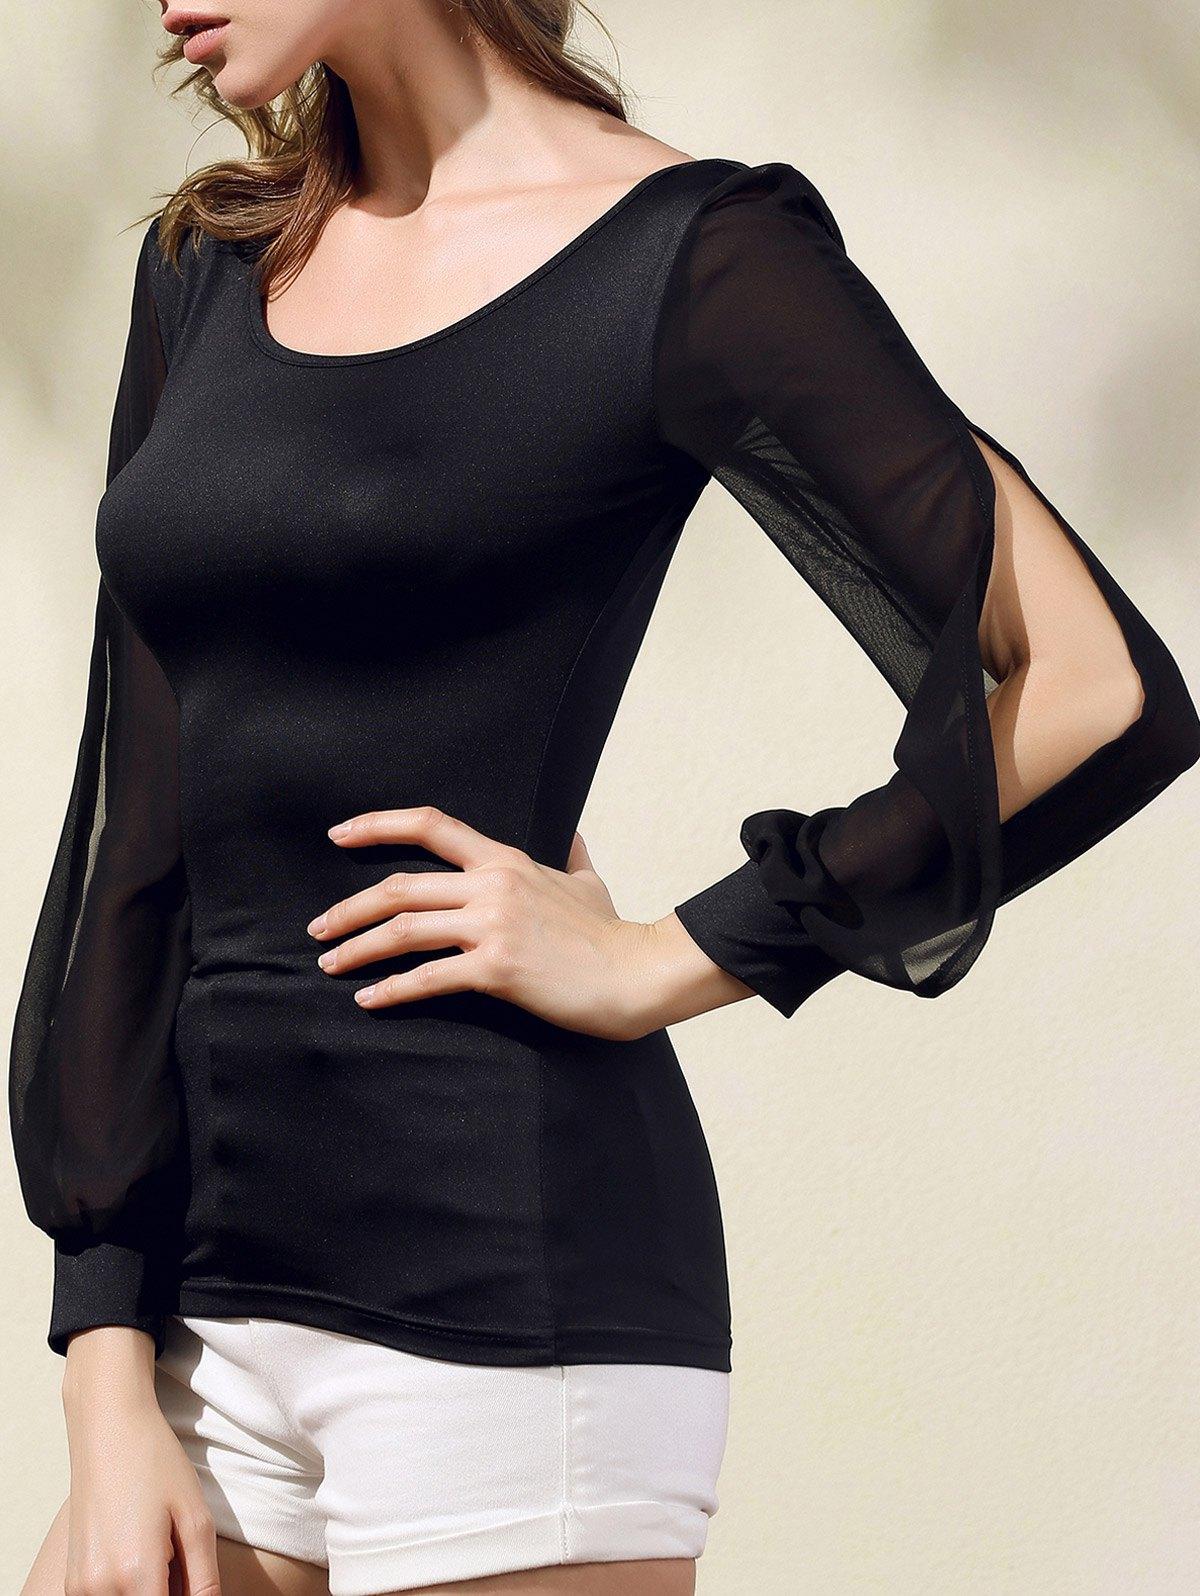 Chiffon Spliced Scoop Neck Long Sleeve T Shirt 183072501